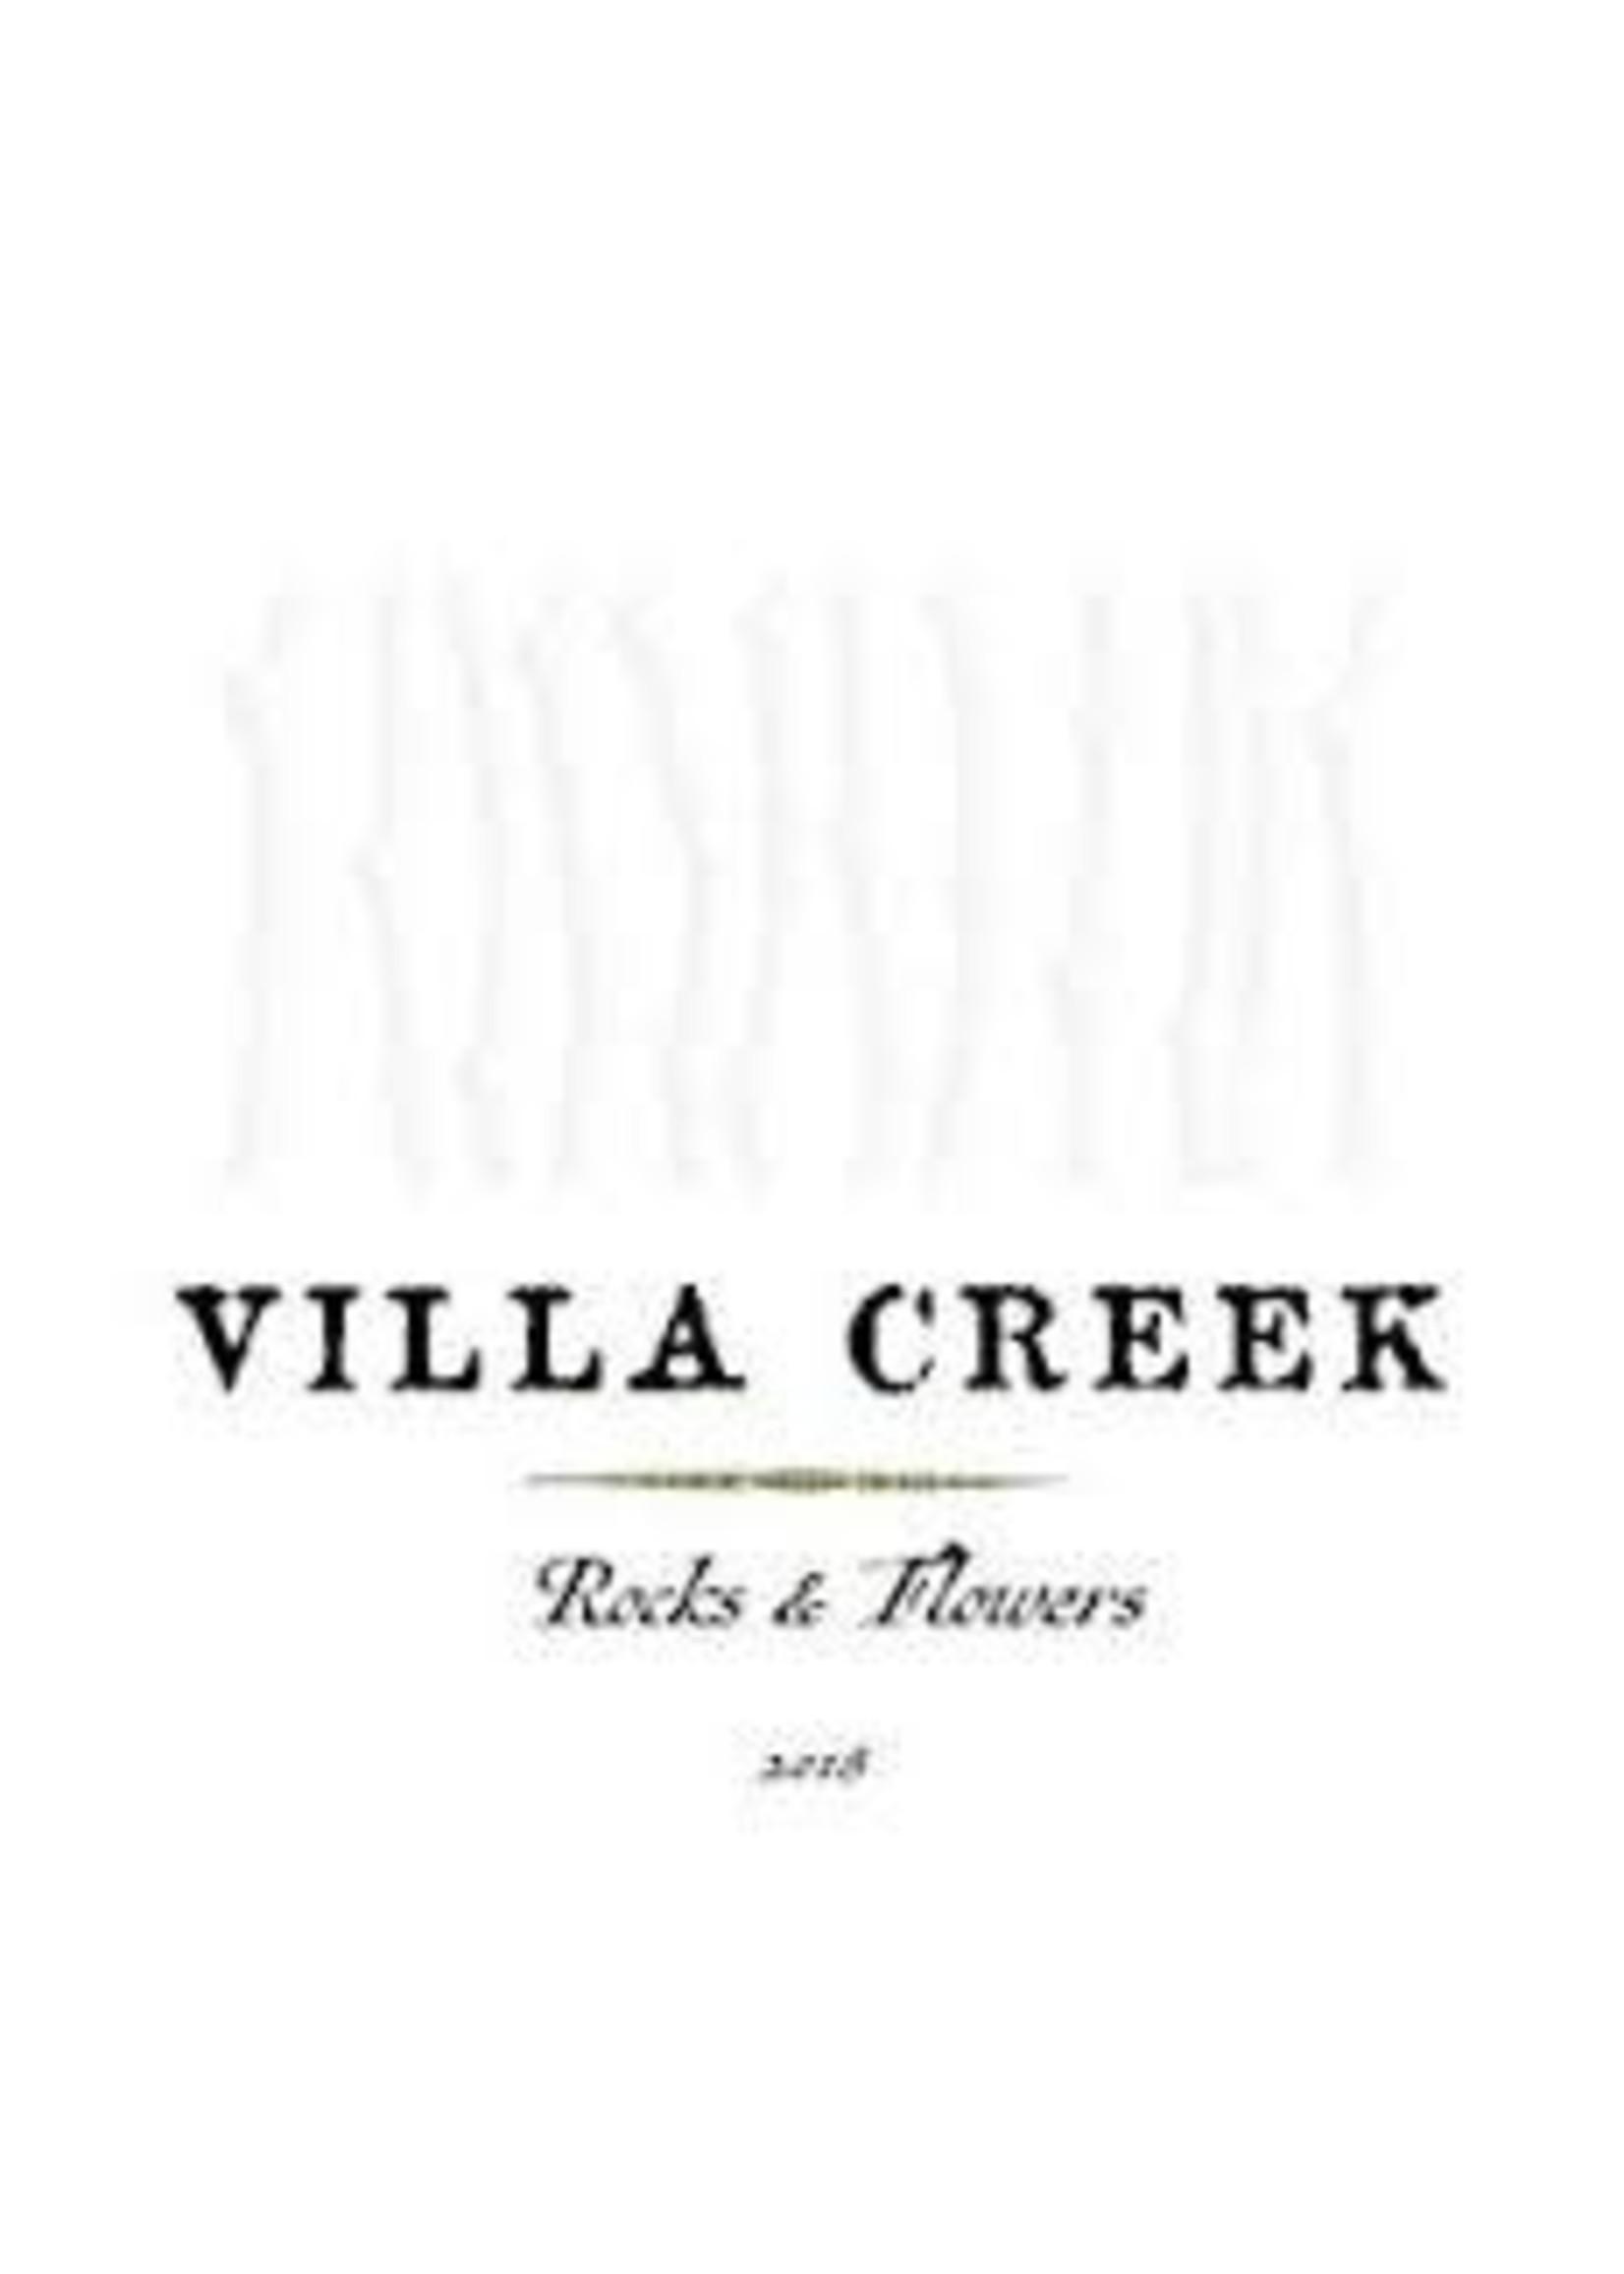 Villa Creek 2018 'Rocks & Flowers' Red 750ml